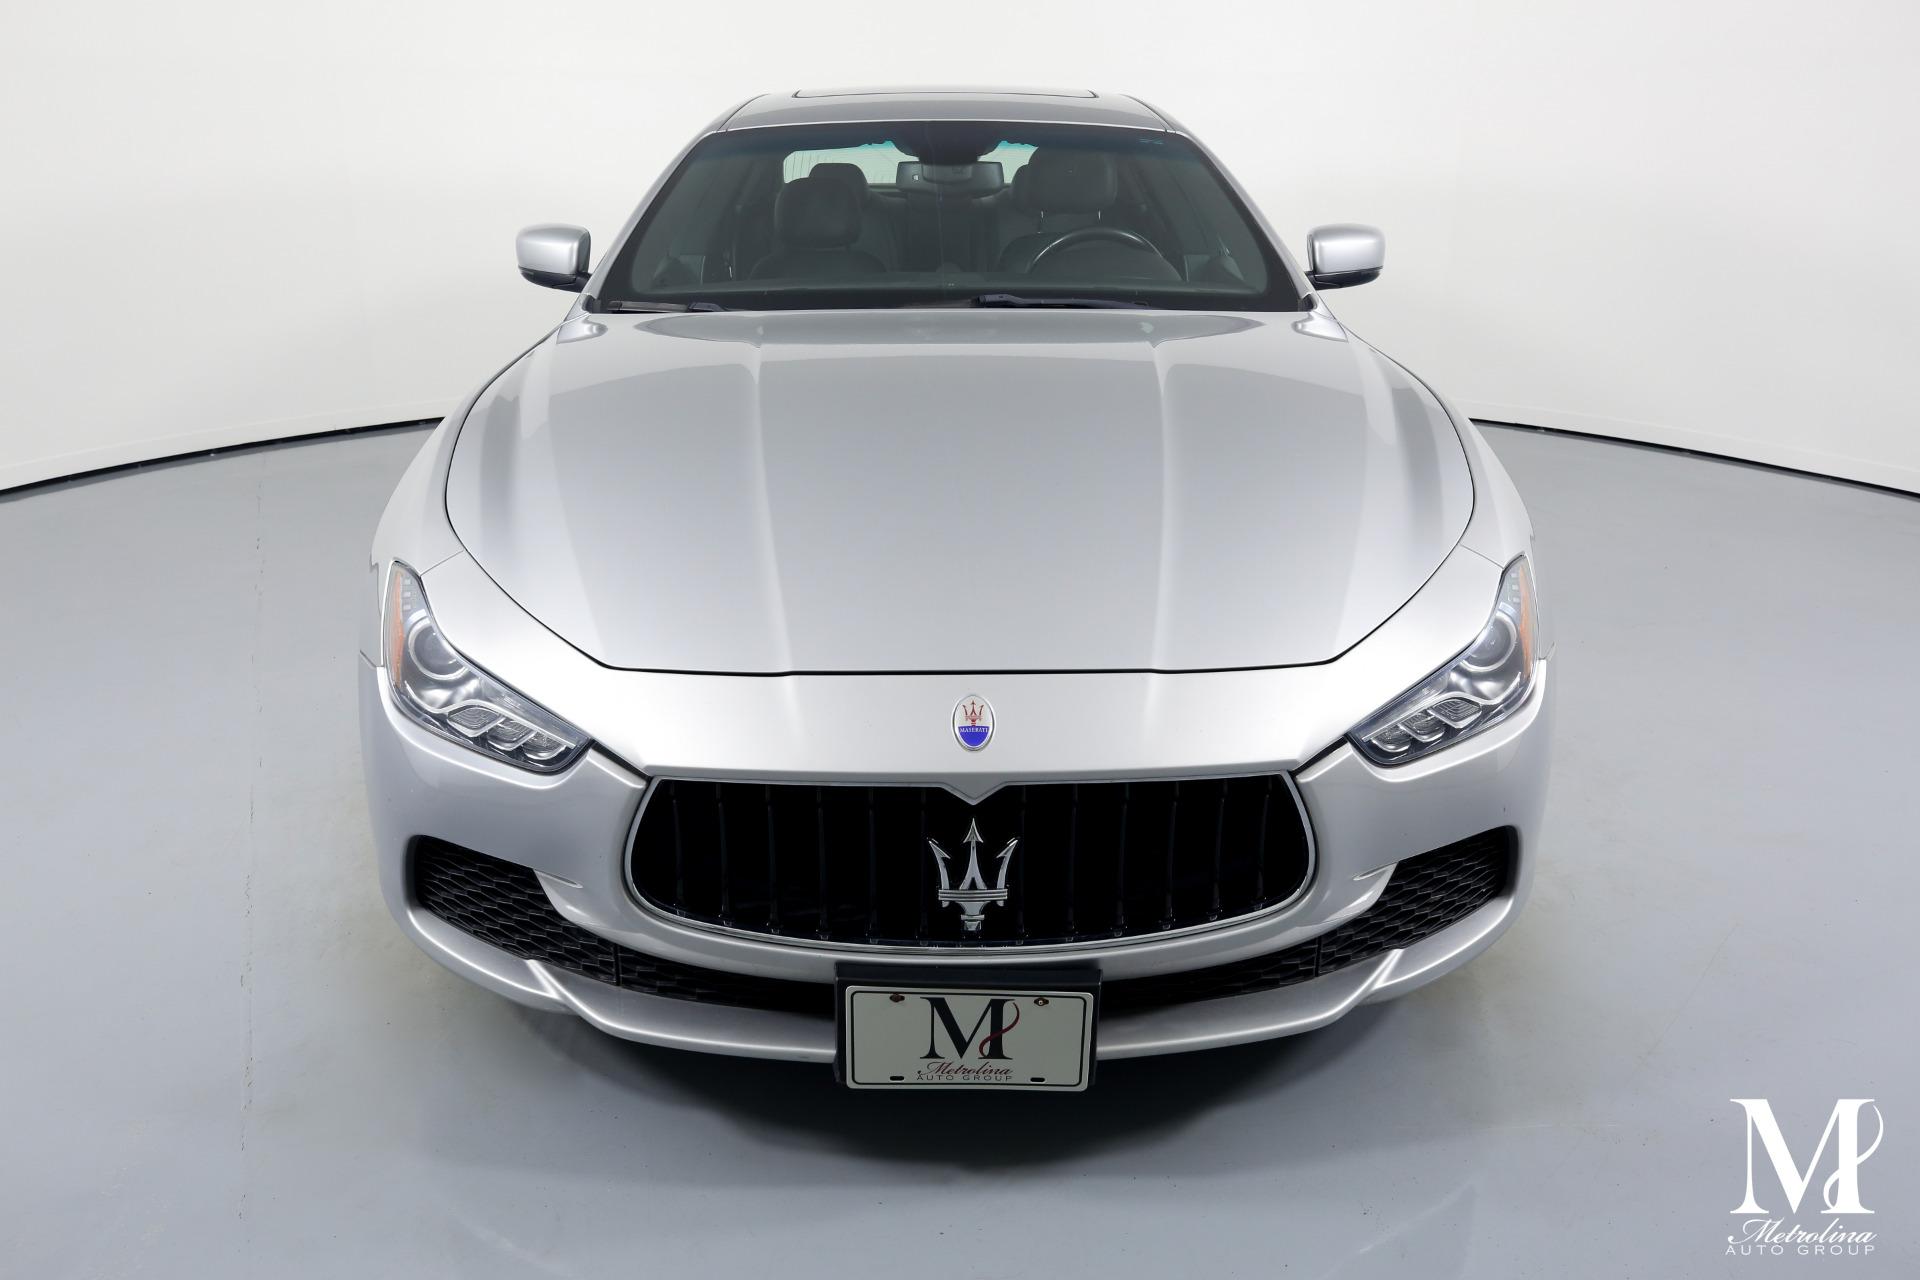 Used 2014 Maserati Ghibli for sale $25,996 at Metrolina Auto Group in Charlotte NC 28217 - 3